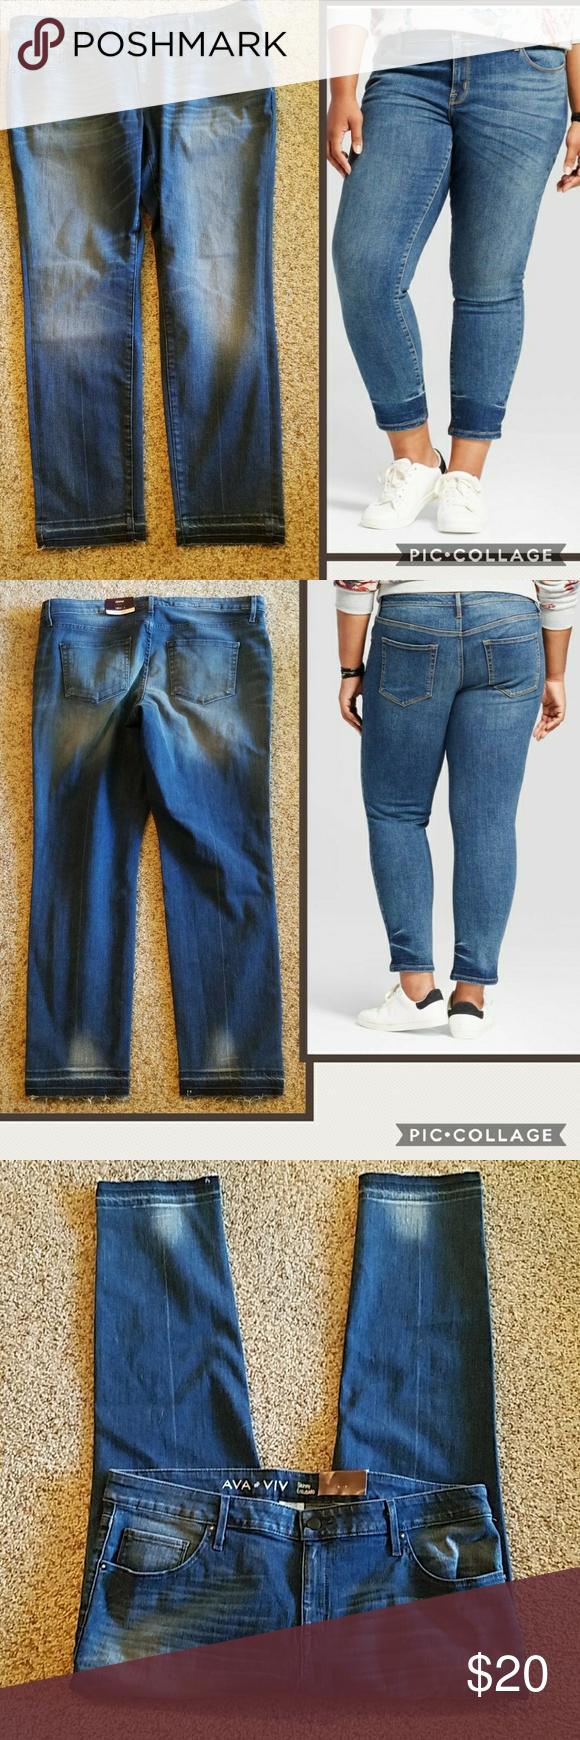 b5e5ada4772 Ava   Viv plus size skinny jeans